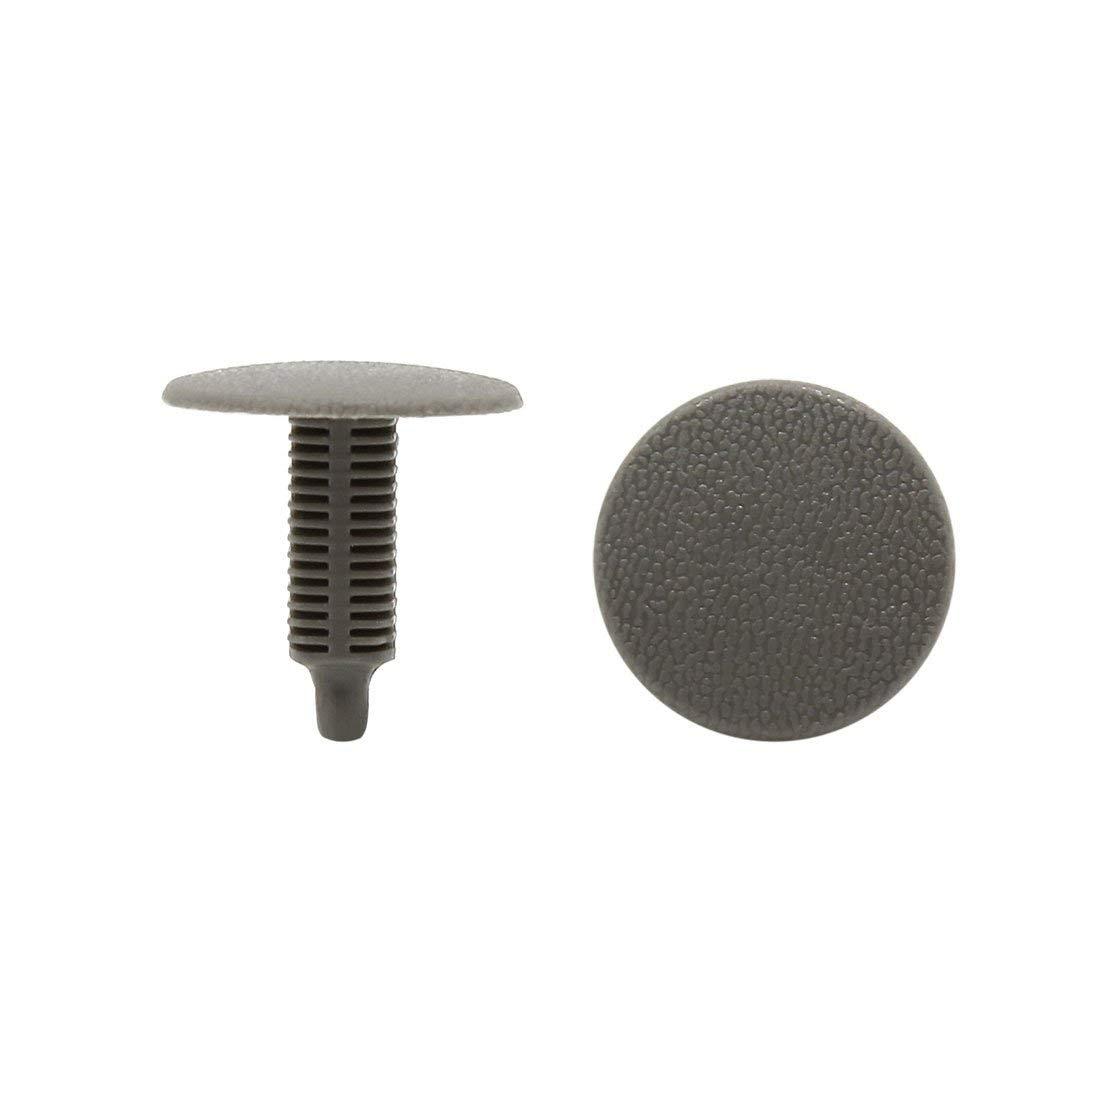 Gm front and rear fender and door peak moulding fastener 20Pcs